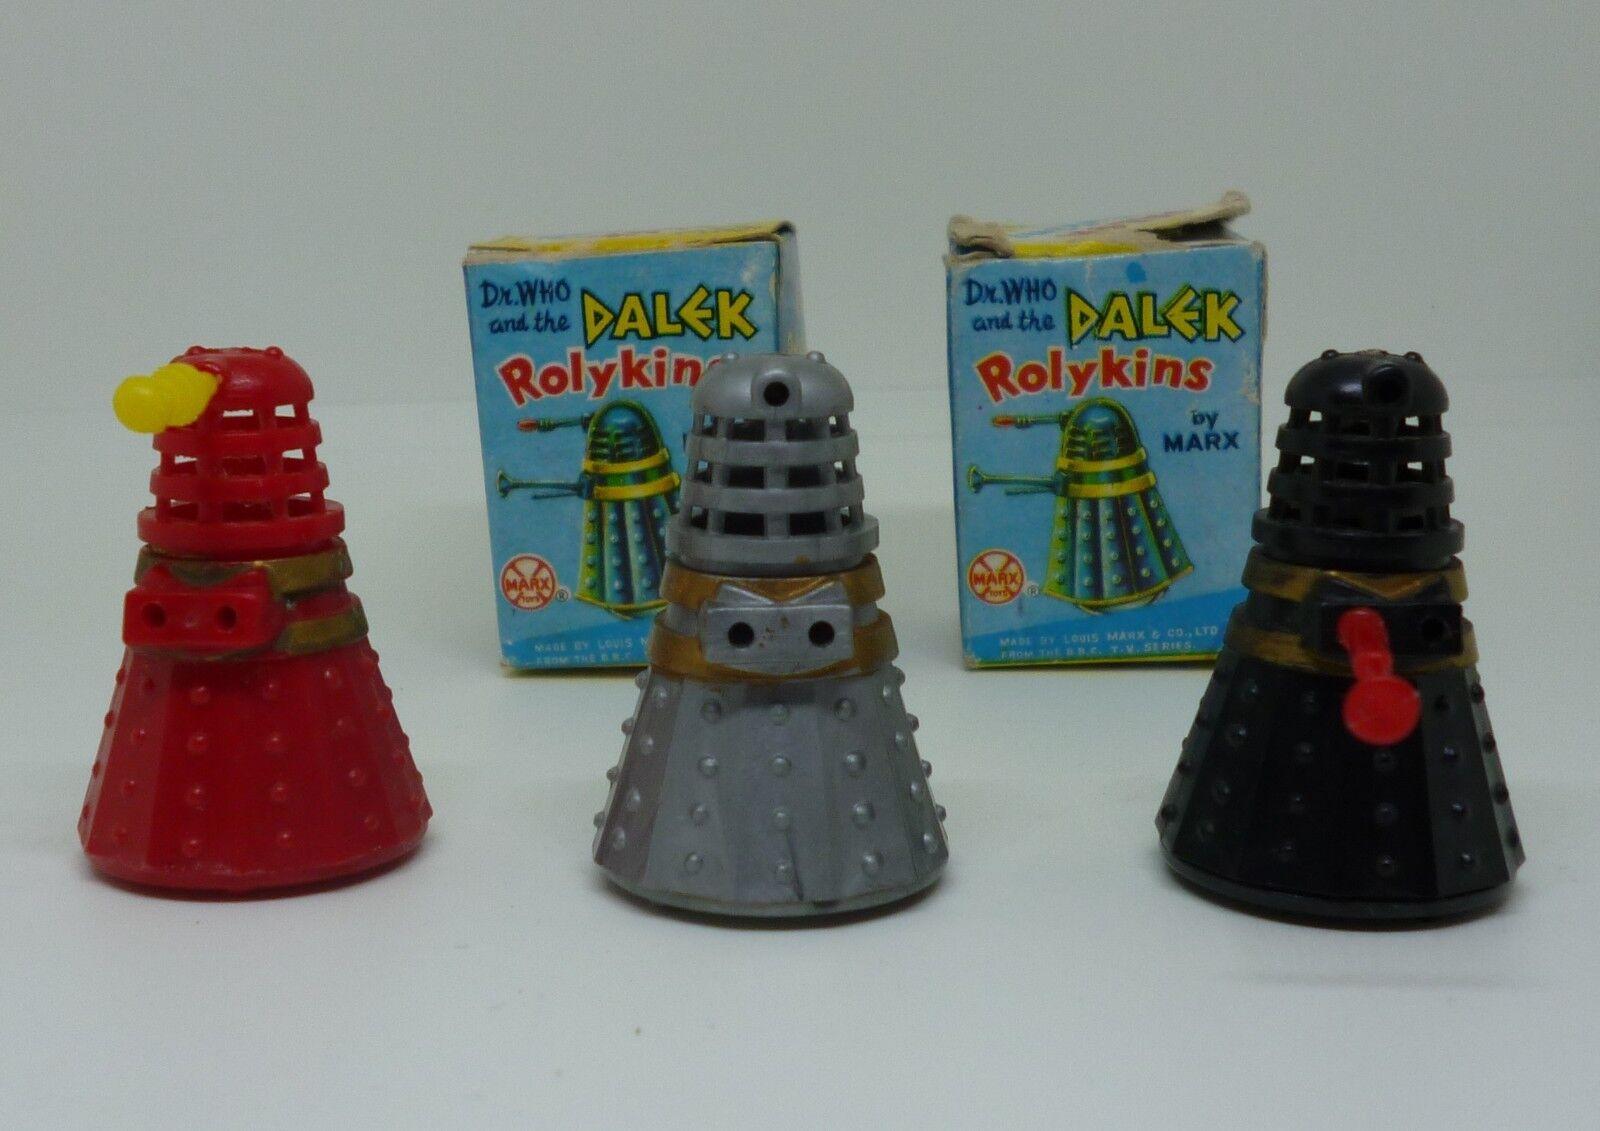 VINTAGE 1965 Marx rolykins Doctor Who Dalek con scatole originali insieme di tre